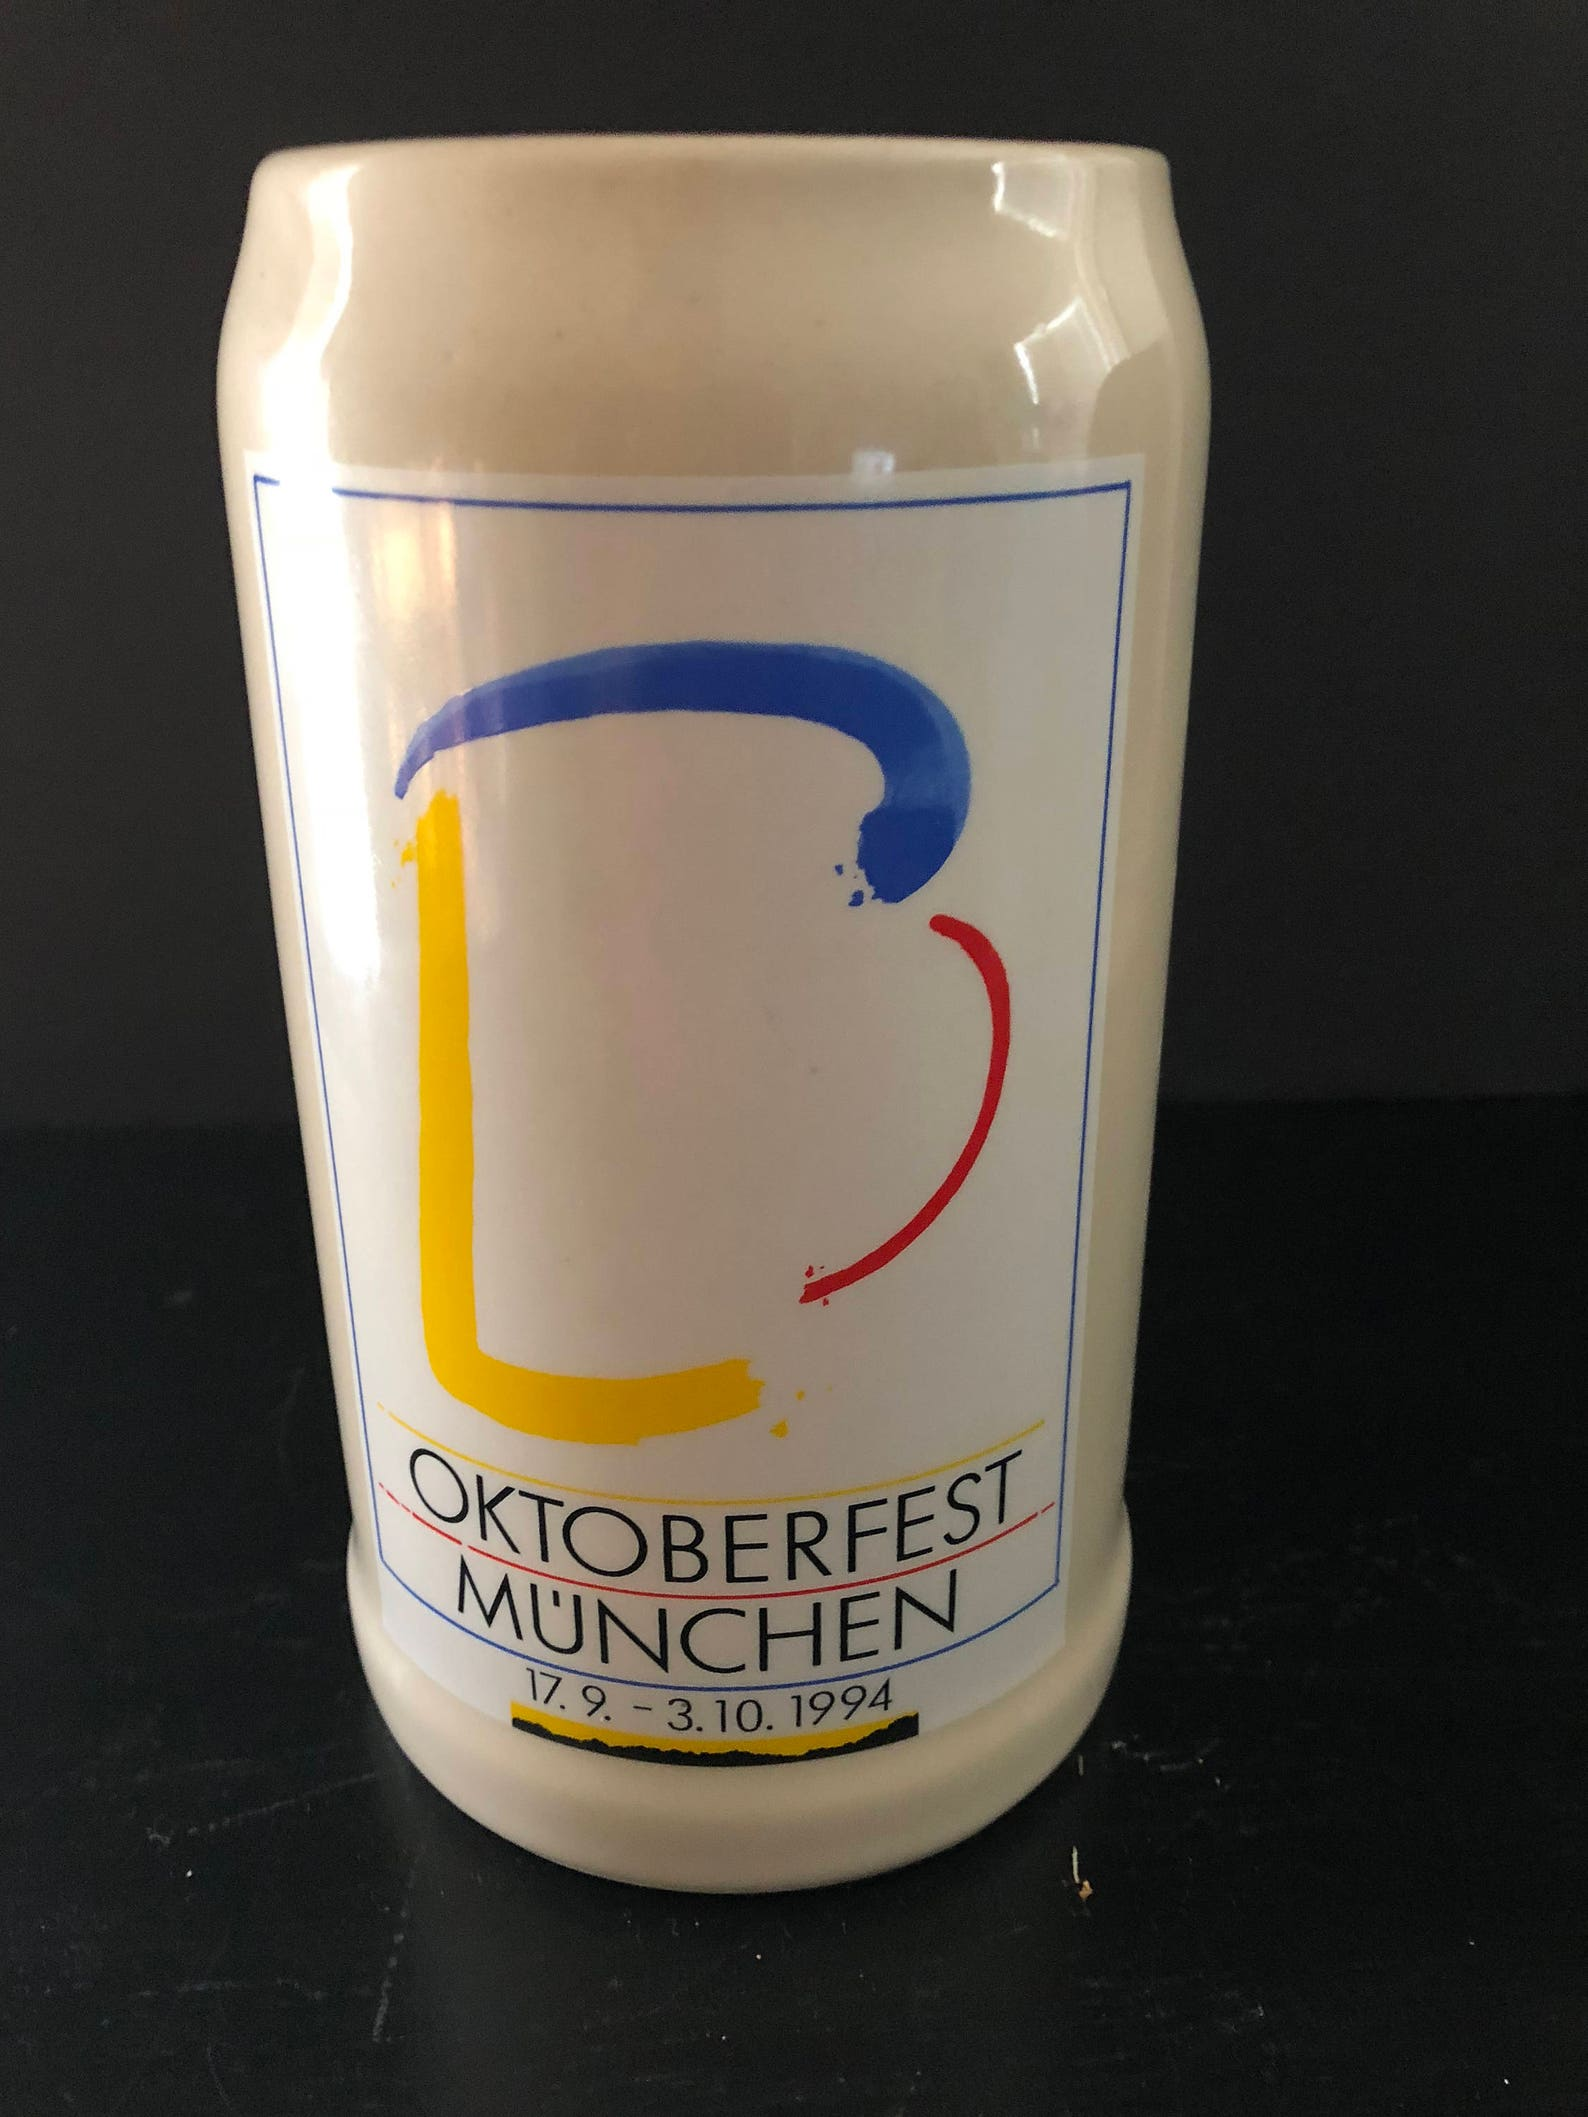 Vintage Oktoberfest Munchen beer stein, stamped and signed